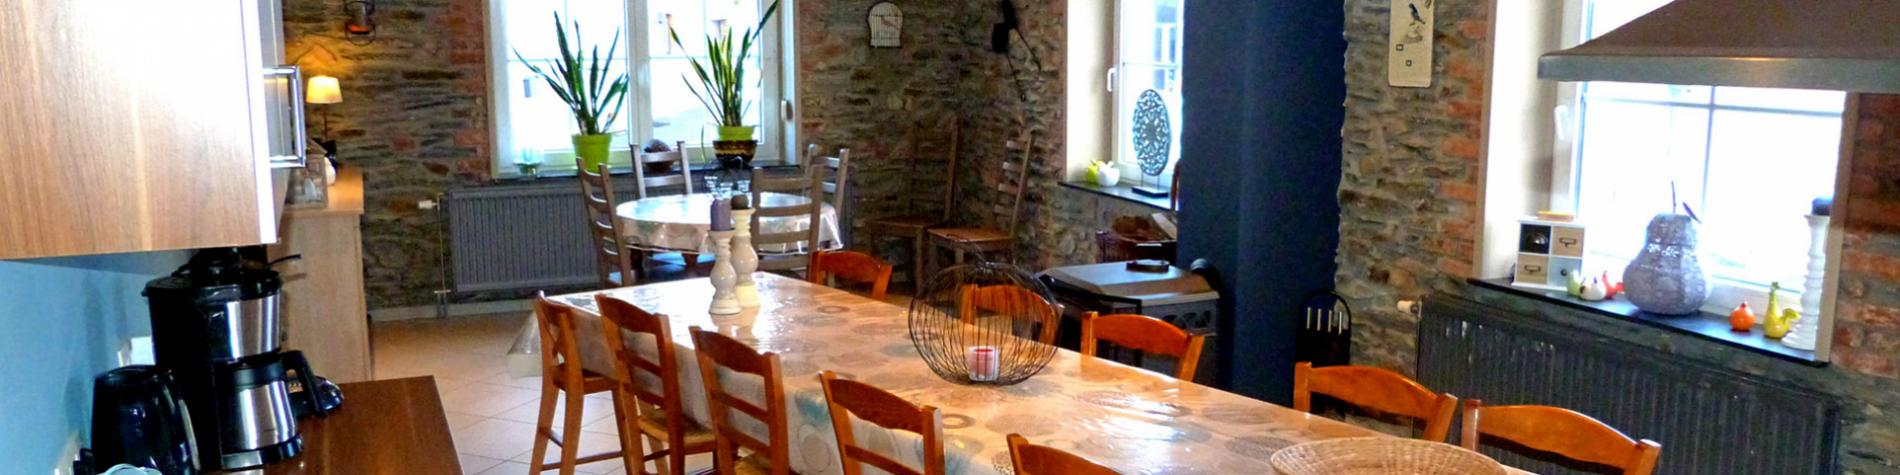 Gîtes du Rancourt - Le Logis - Gîte rural - Sainte-Ode - Ardenne